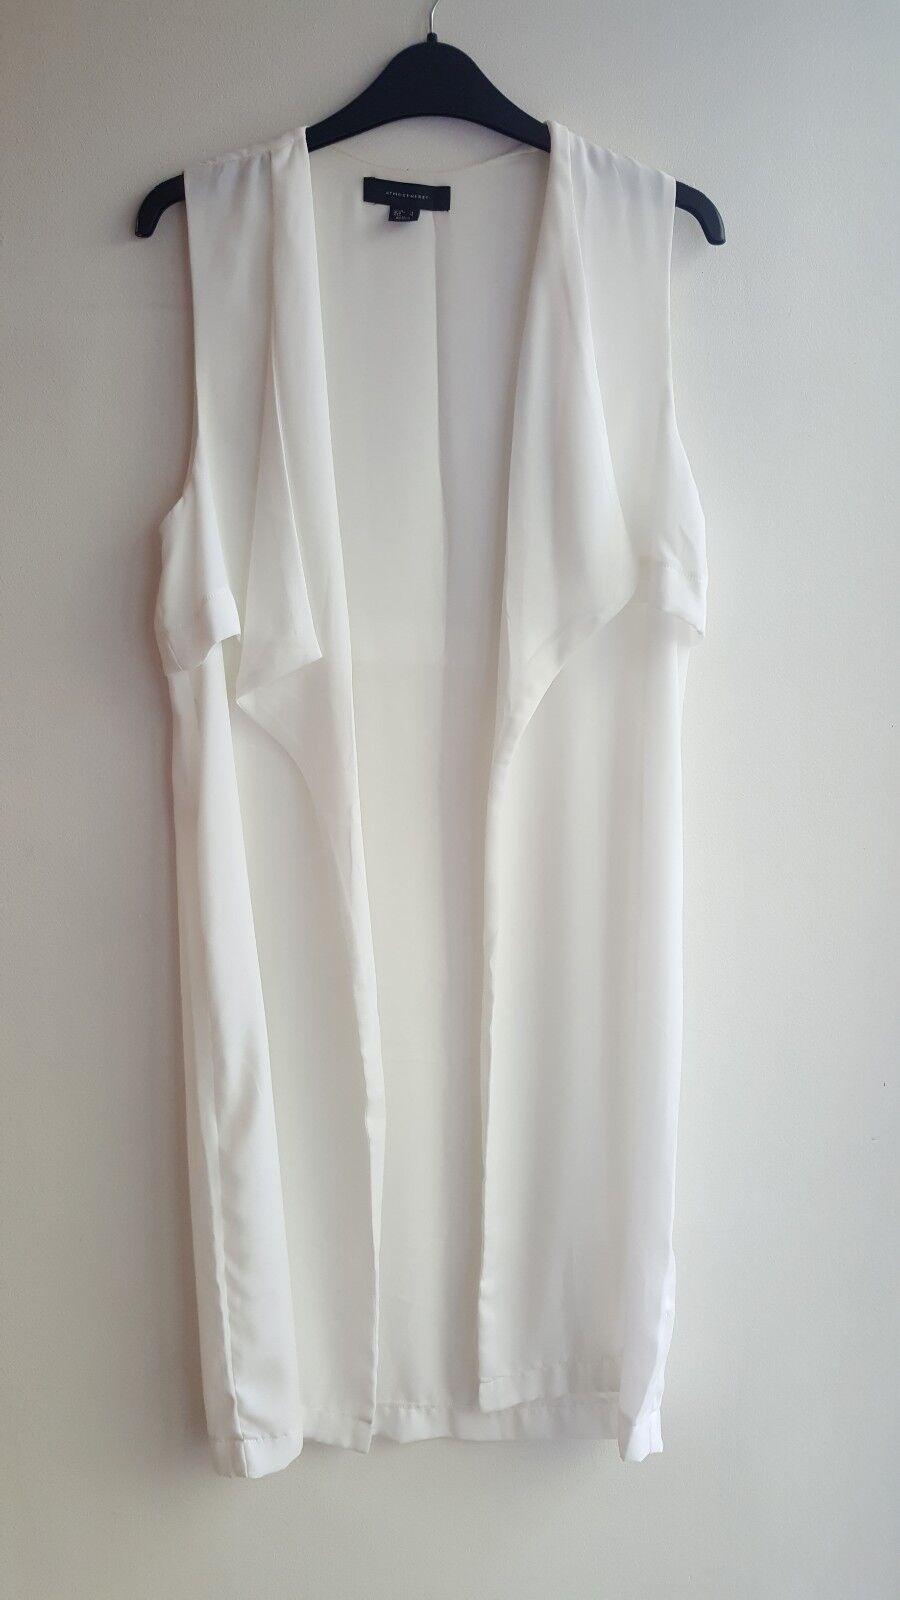 Primark Atmosphere Size 8 White/ Cream Waistcoat Jacket Longline